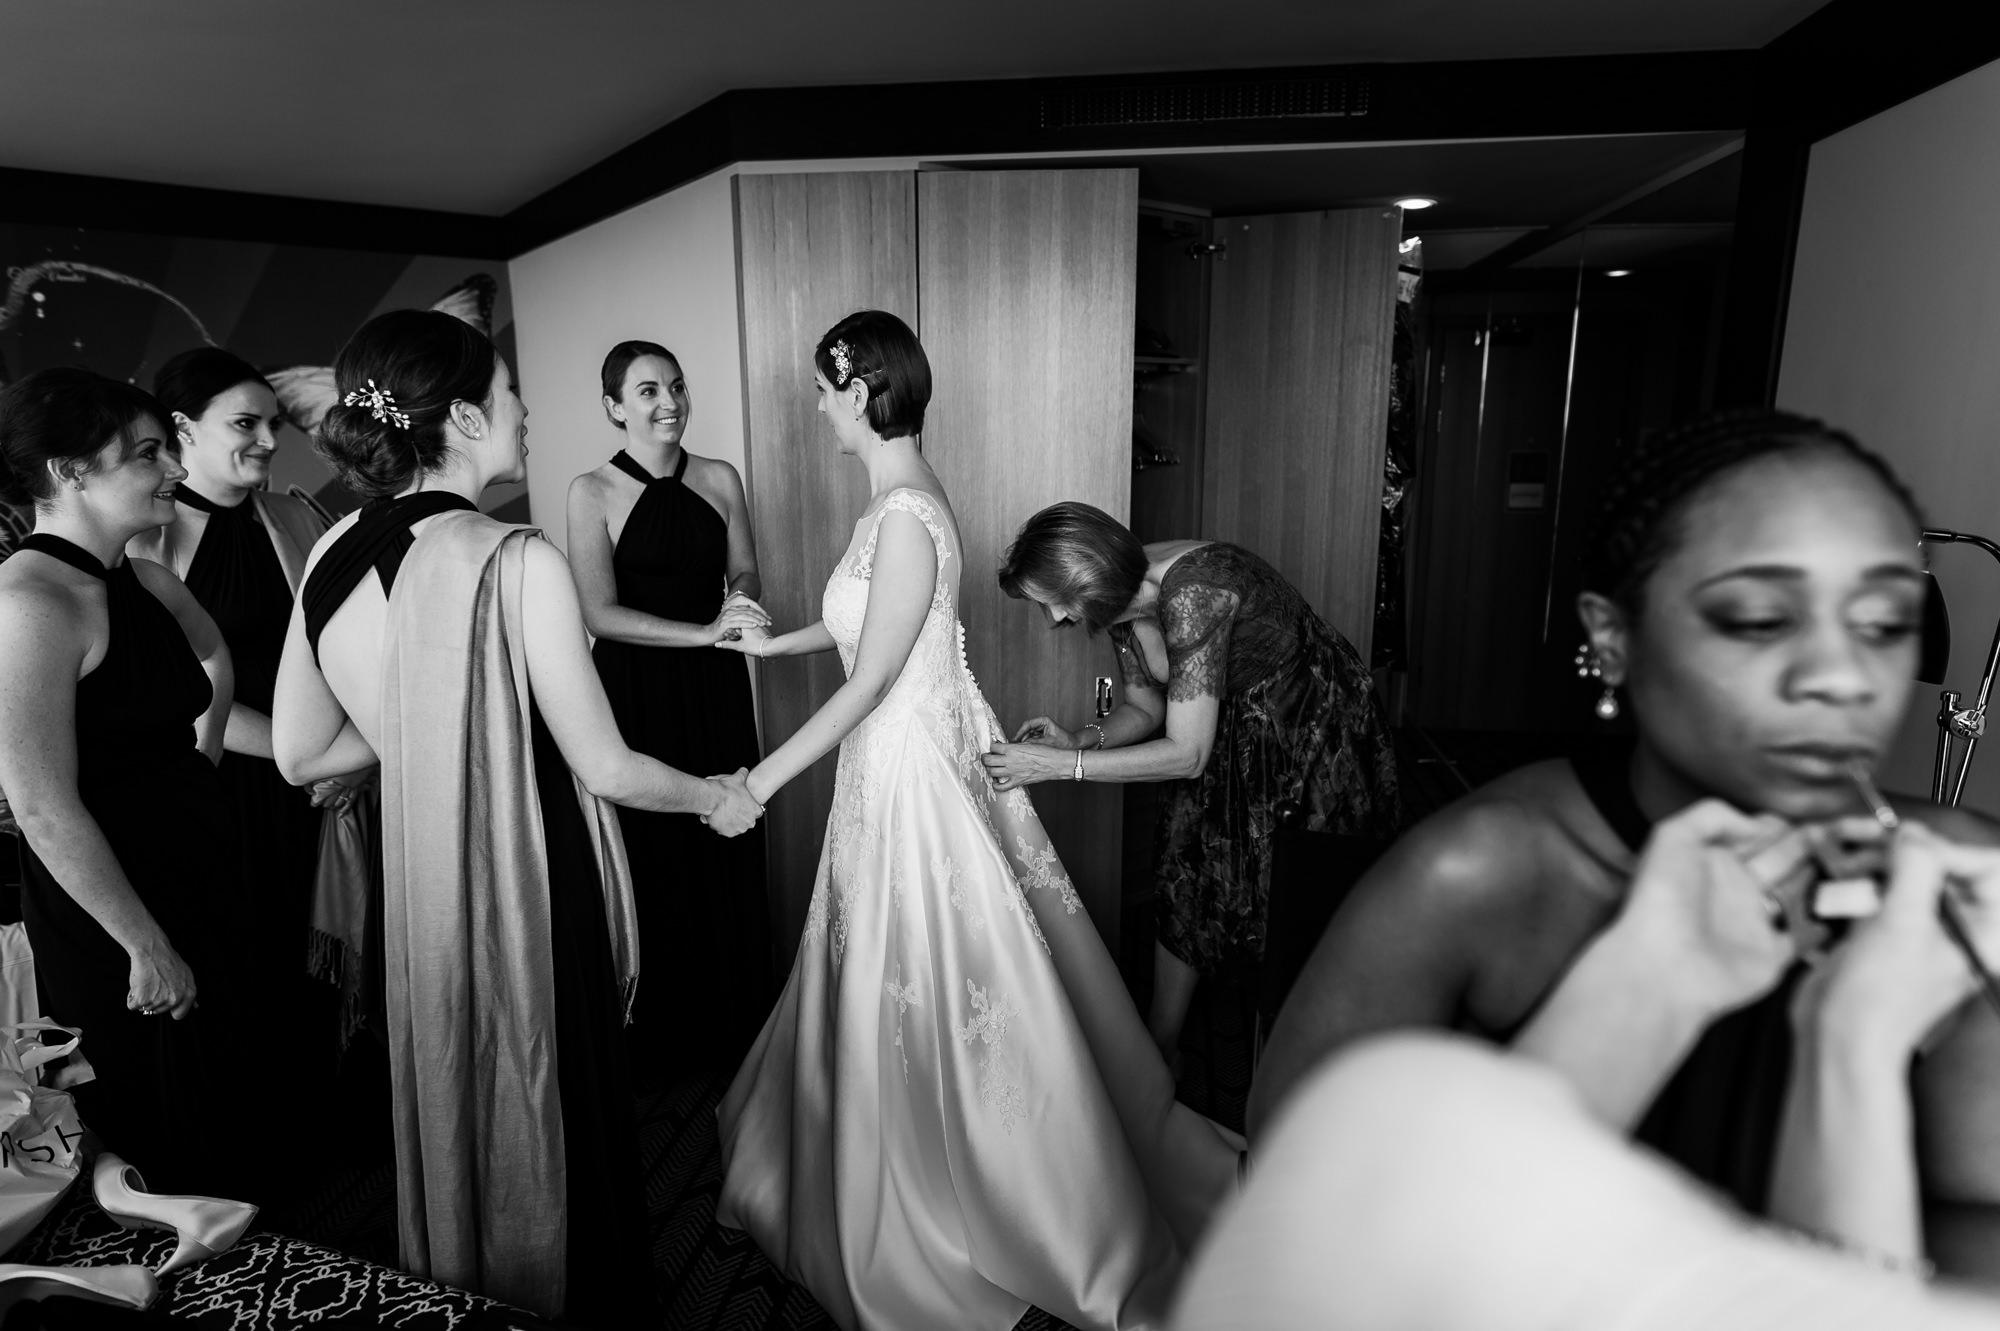 Larkhill weddings